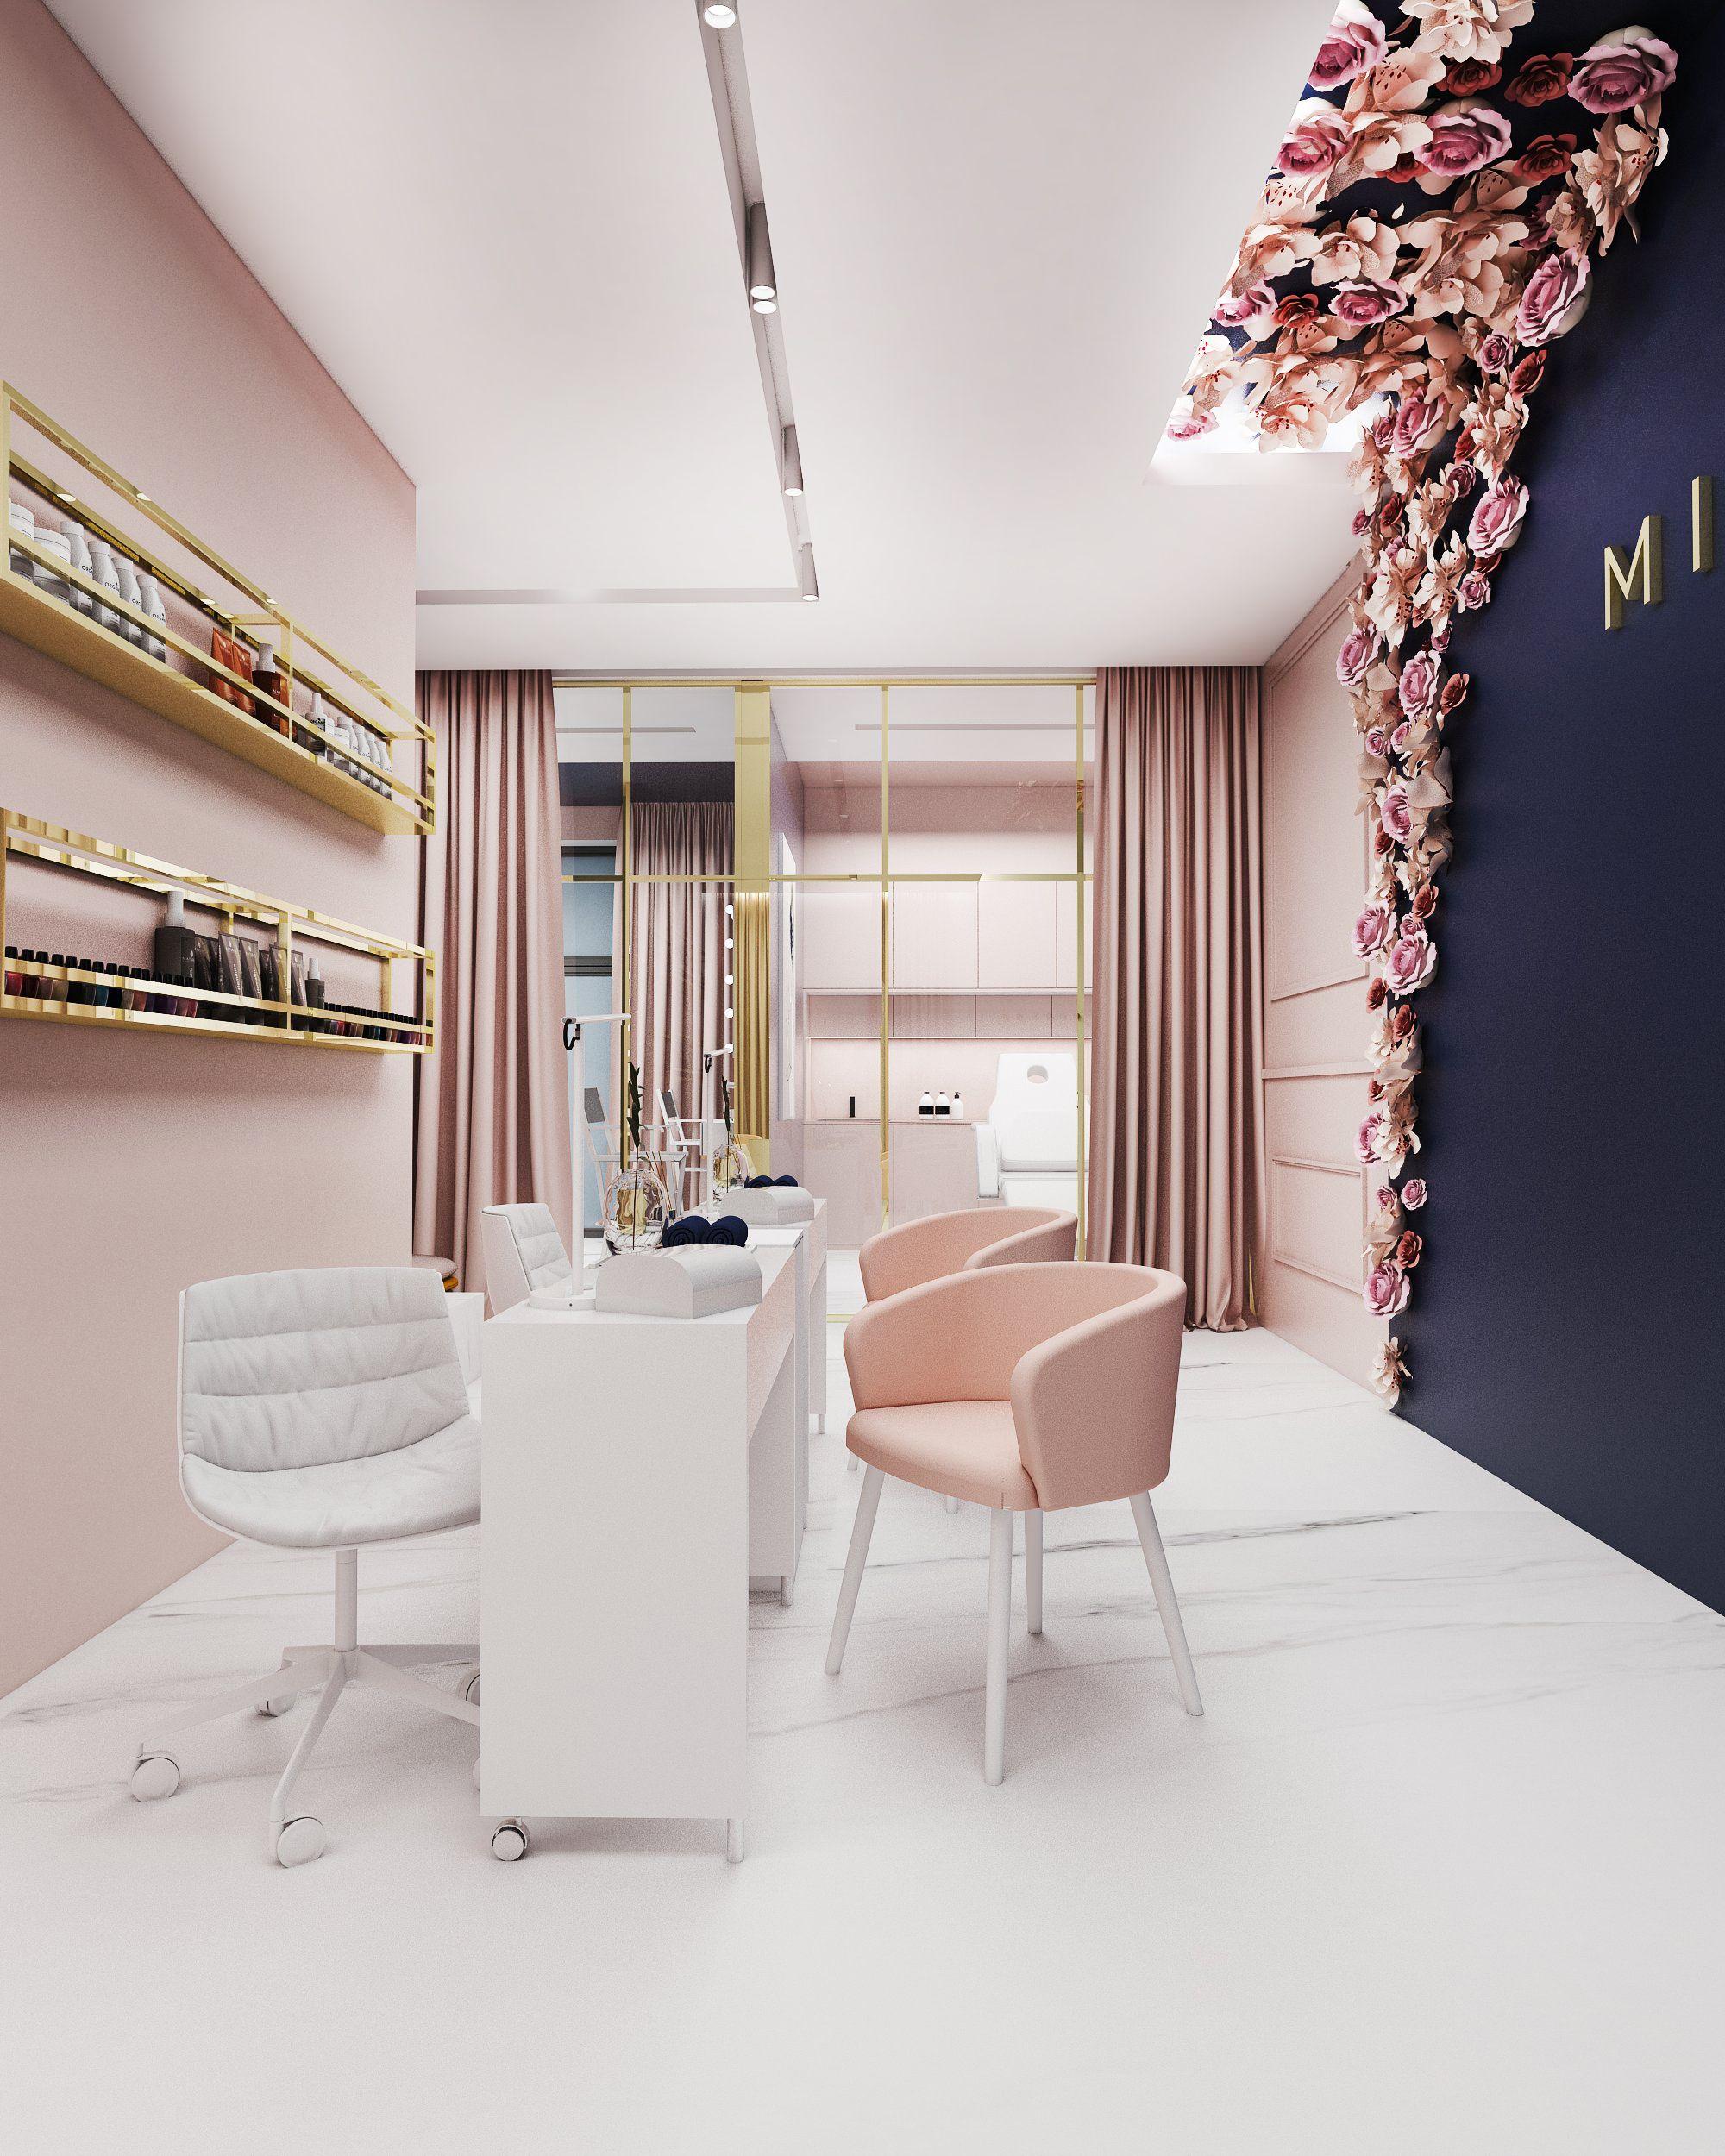 Salon Pieknosci Tychy Foorma With Images Salon Interior